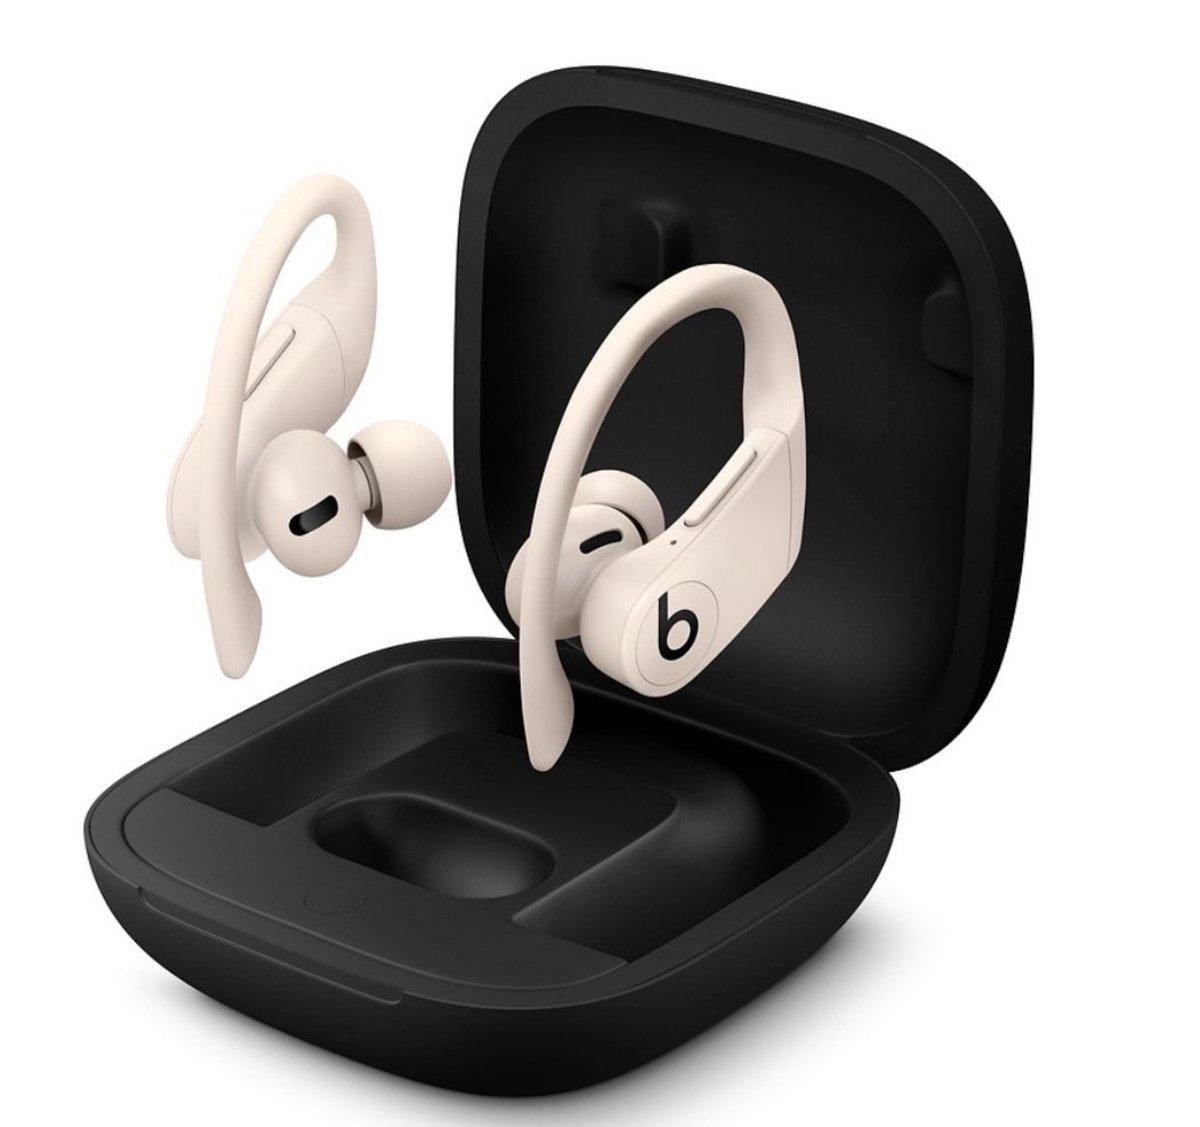 Powerbeats Pro 完全無線耳機[象牙白色][香港行貨]